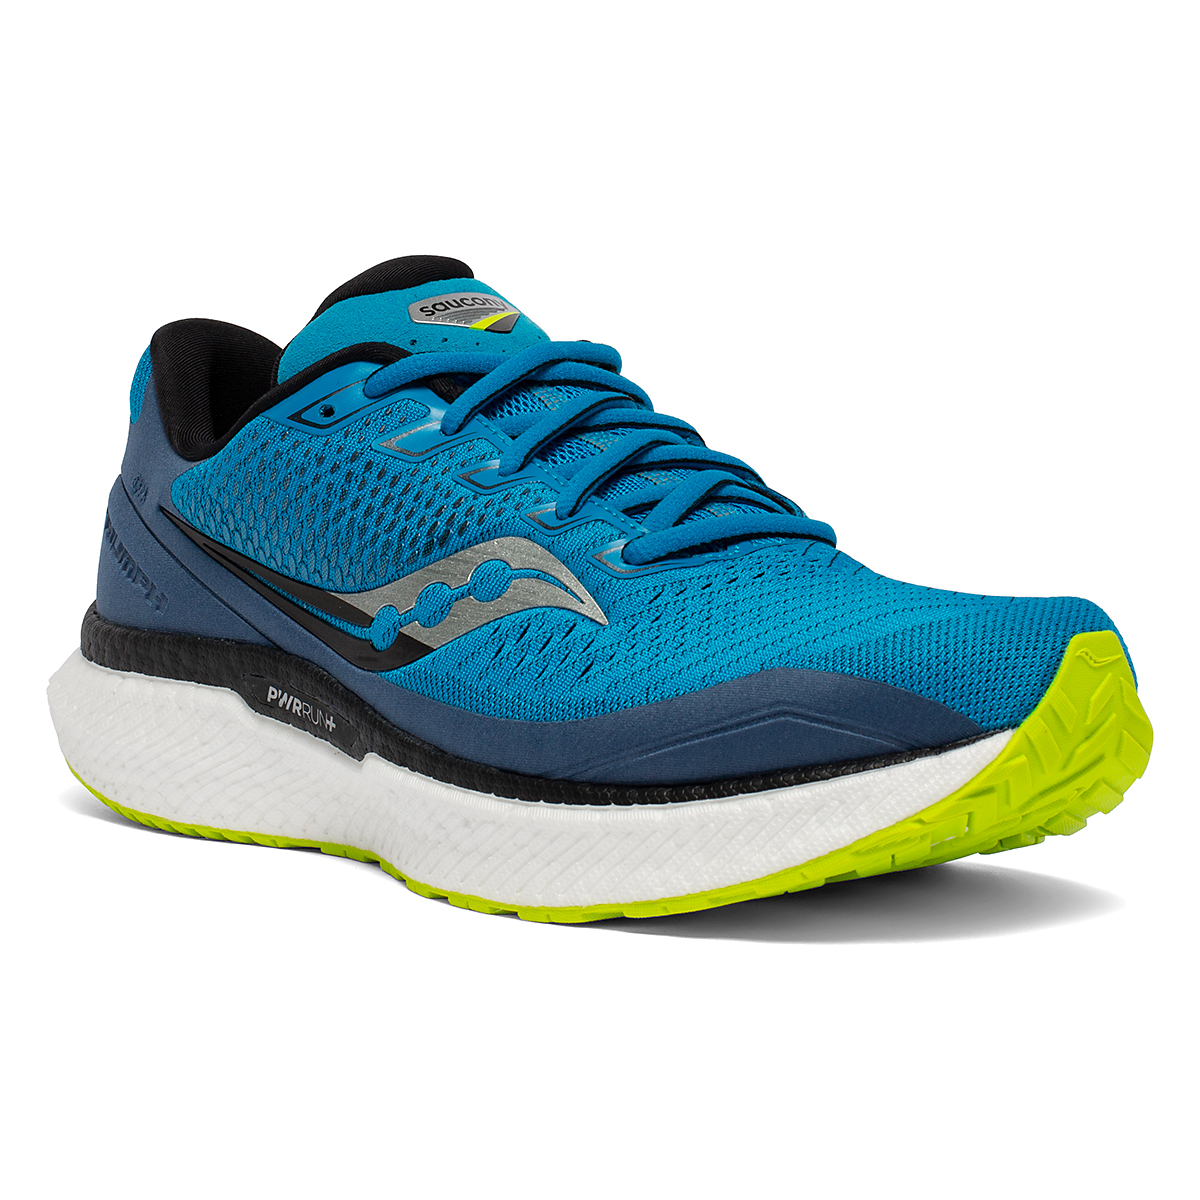 Men's Saucony Triumph 18 Running Shoe - Color: Cobalt/Storm - Size: 7 - Width: Regular, Cobalt/Storm, large, image 1